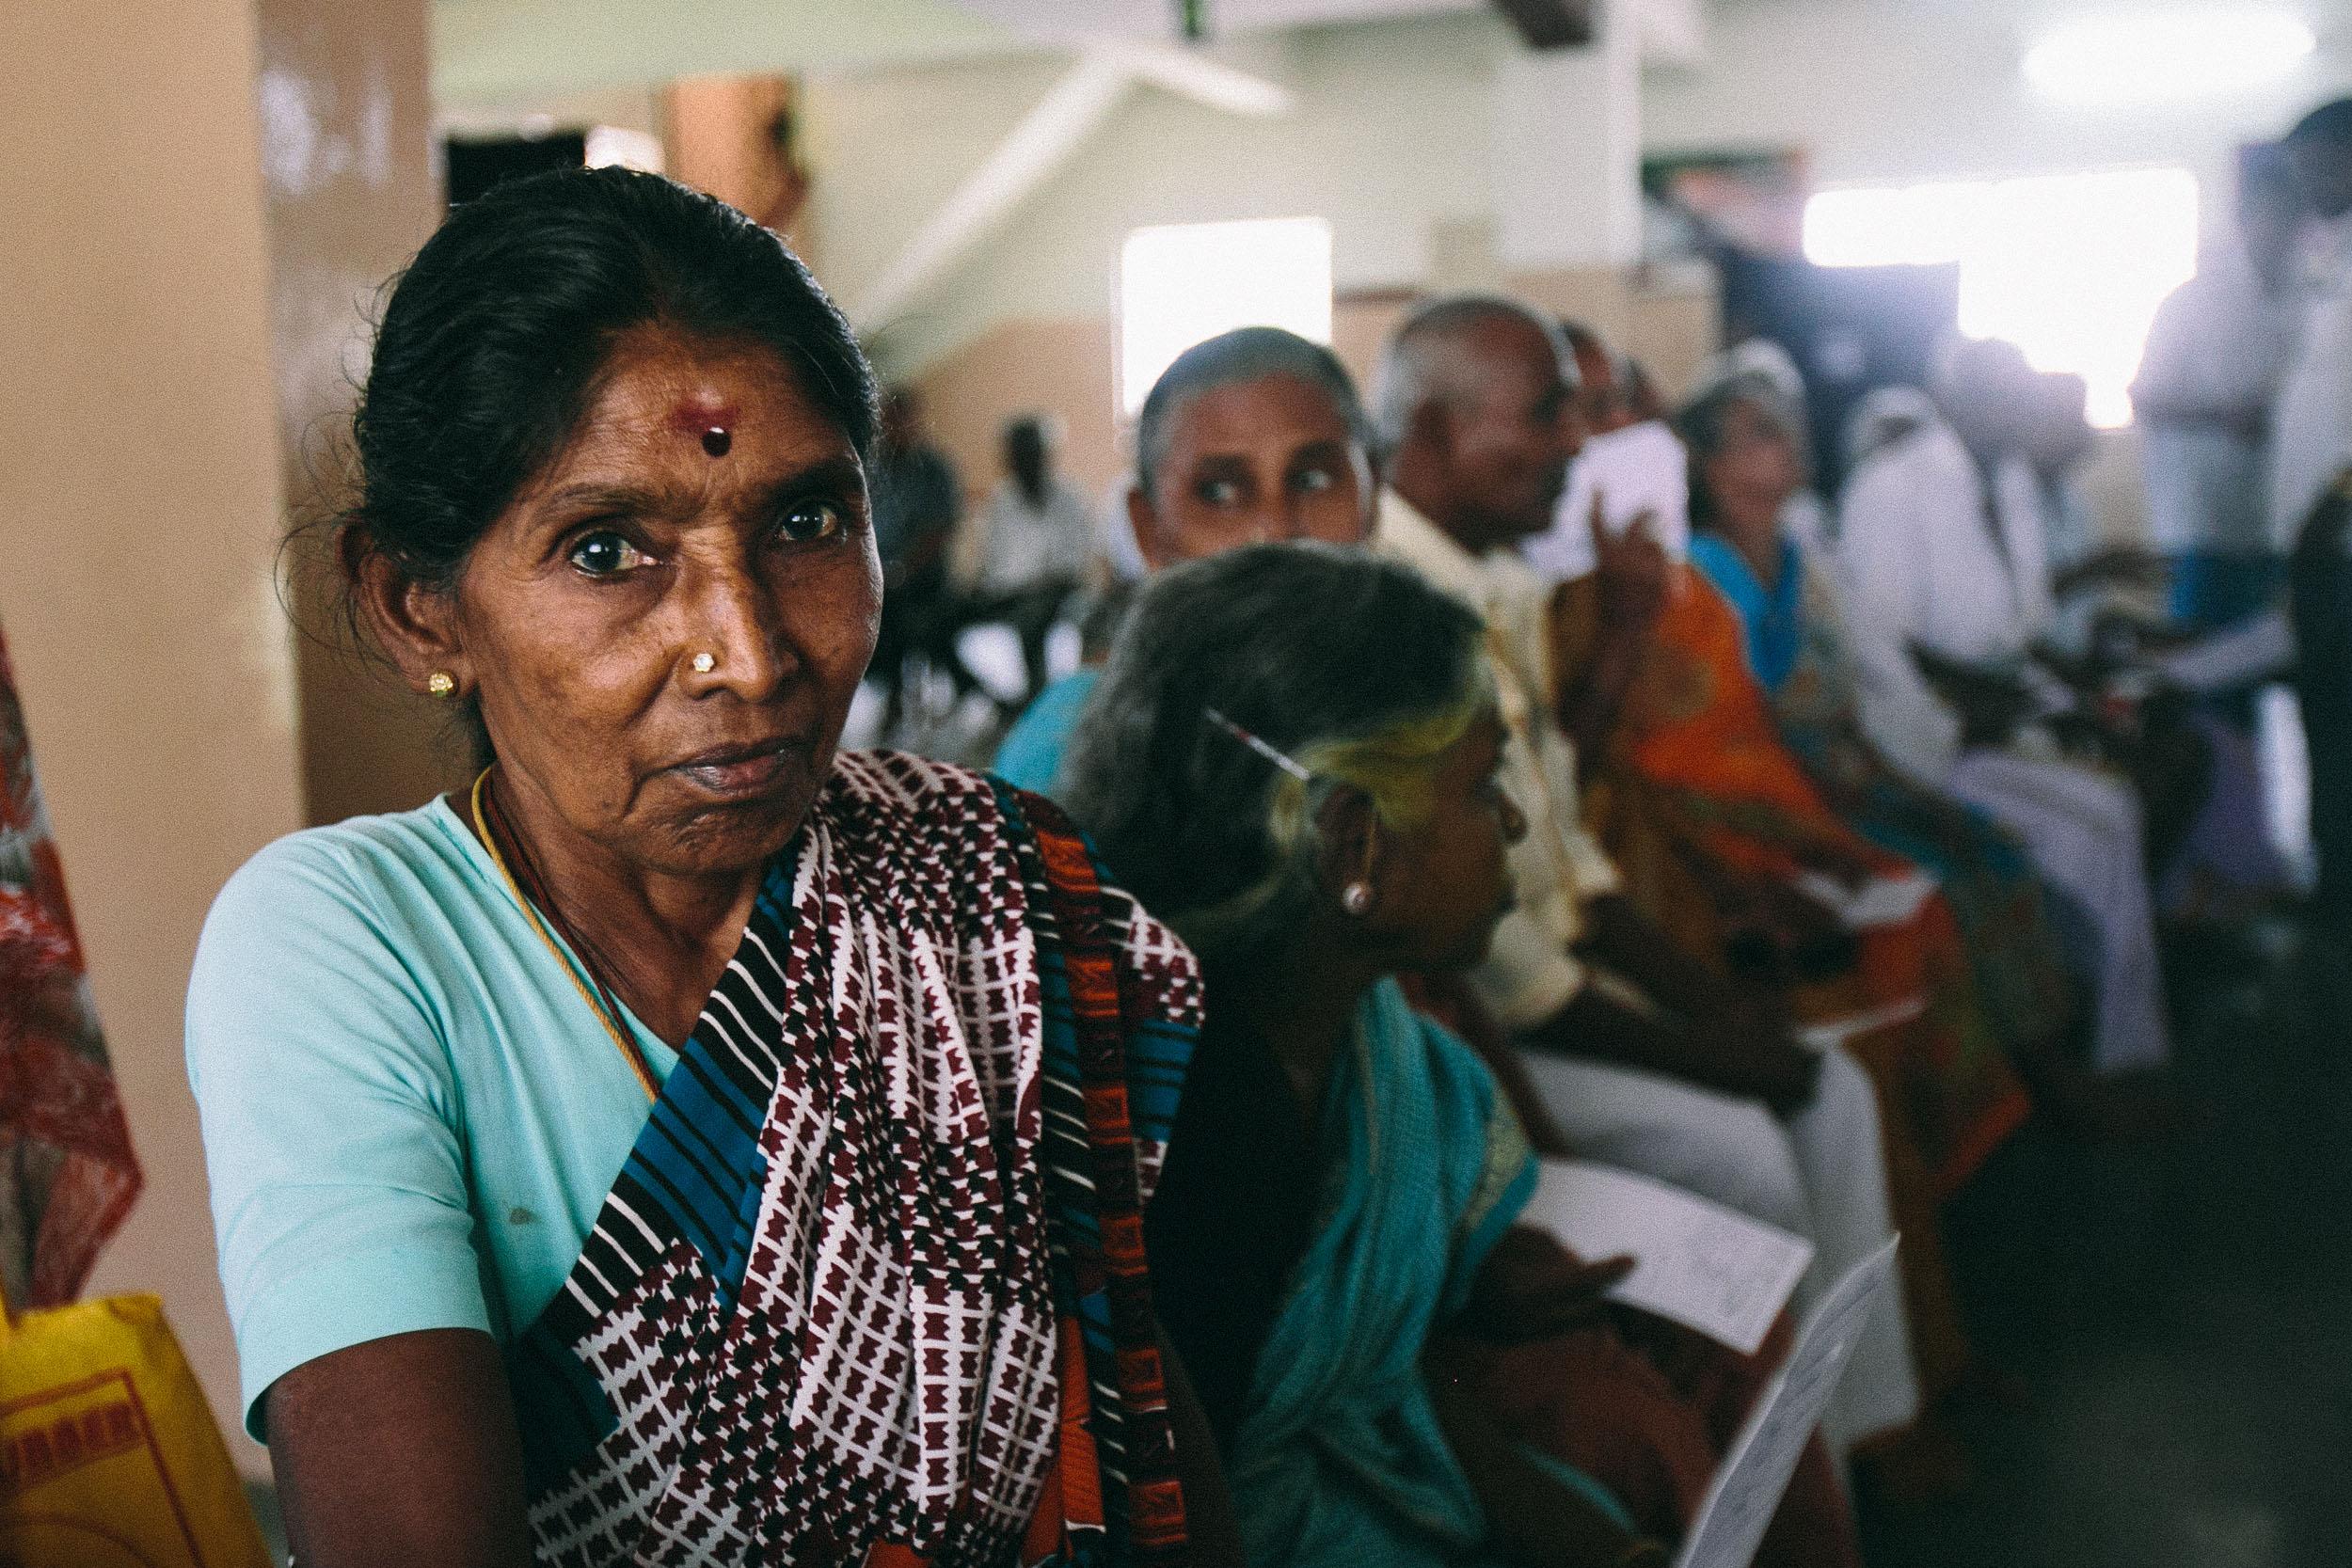 brian-callaway-india-photography-aravind-eye-hospital-11.jpg